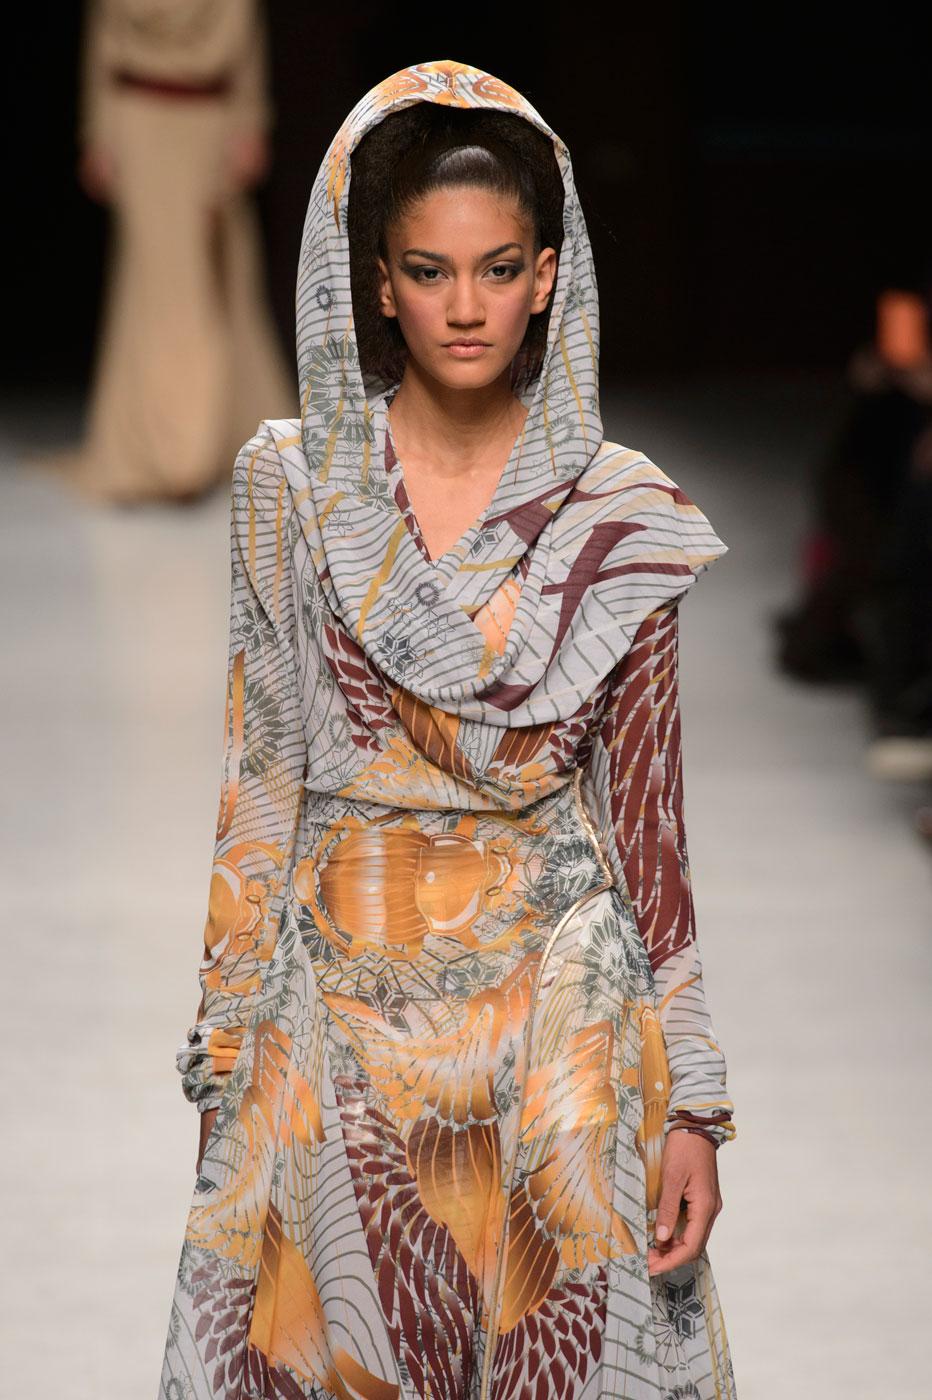 Julien-Fournie-Prive-fashion-runway-show-haute-couture-paris-spring-2015-the-impression-25